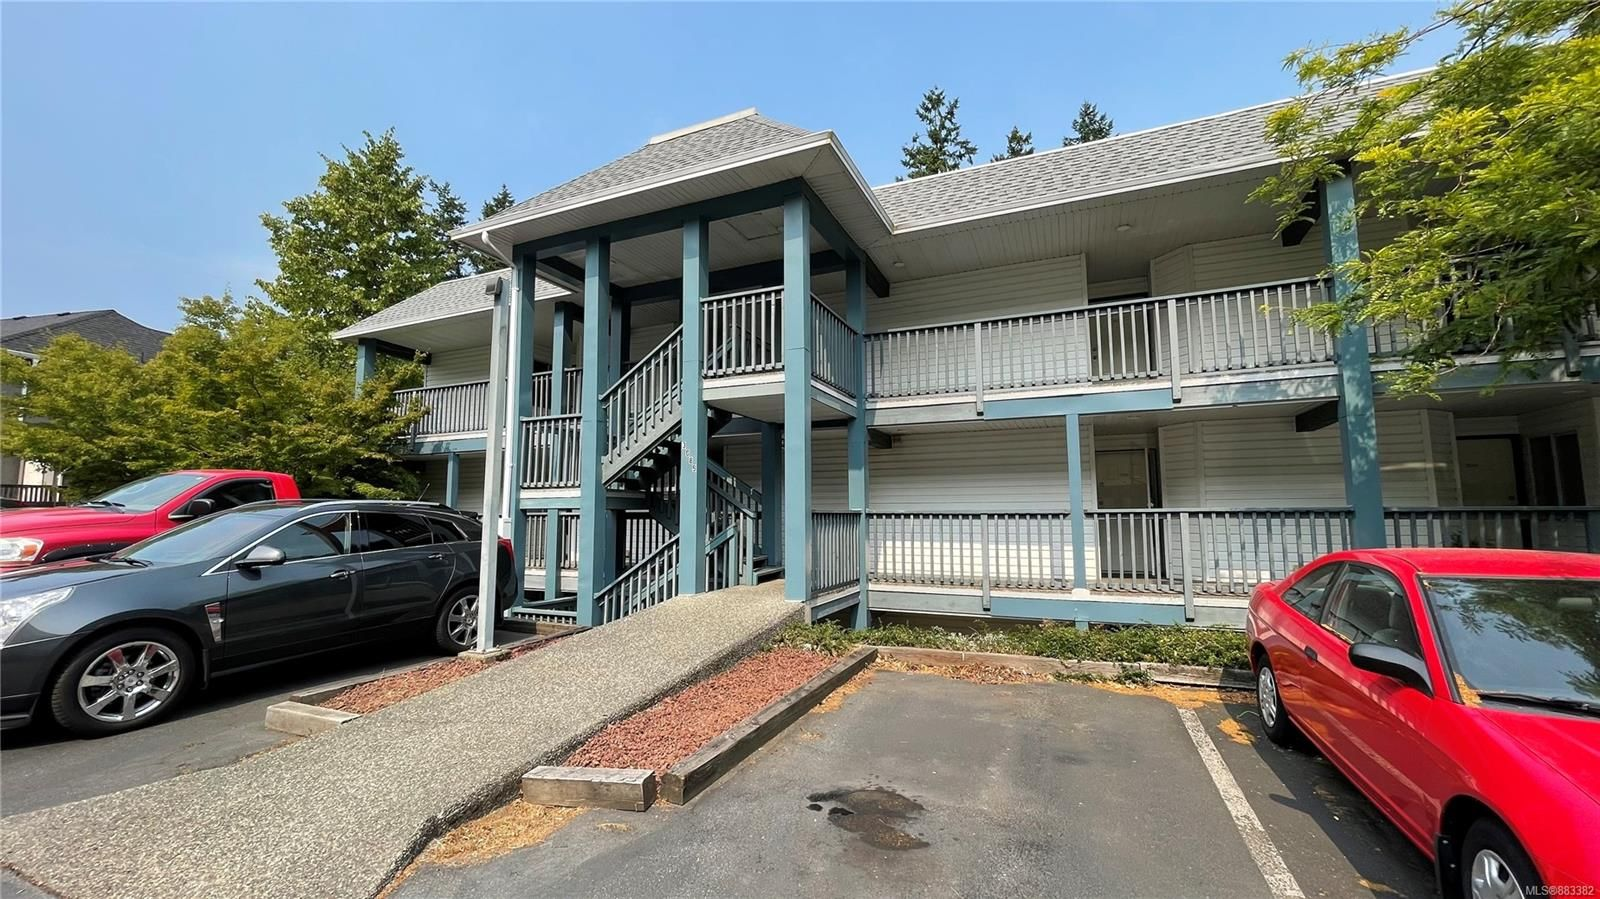 Main Photo: 203 3089 Barons Rd in : Na Uplands Condo for sale (Nanaimo)  : MLS®# 883382